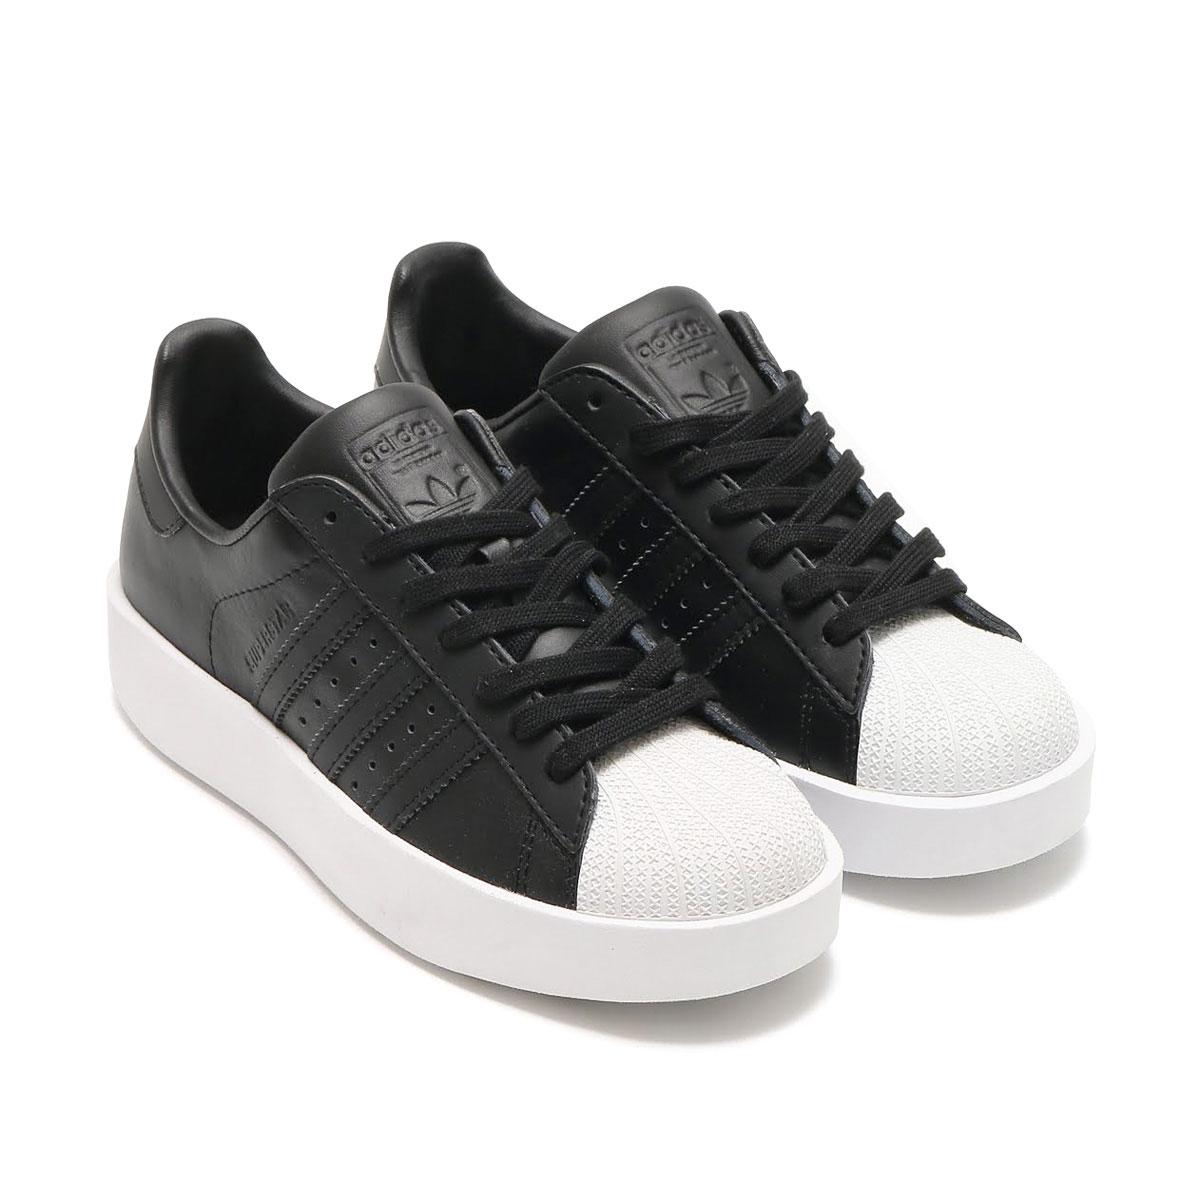 adidas Originals SUPERSTAR BD W (CORE BLACK/CORE BLACK/RUNNING WHITE) (アディダス オリジナルス スーパースターボールド) 【レディース スニーカー】17SS-I